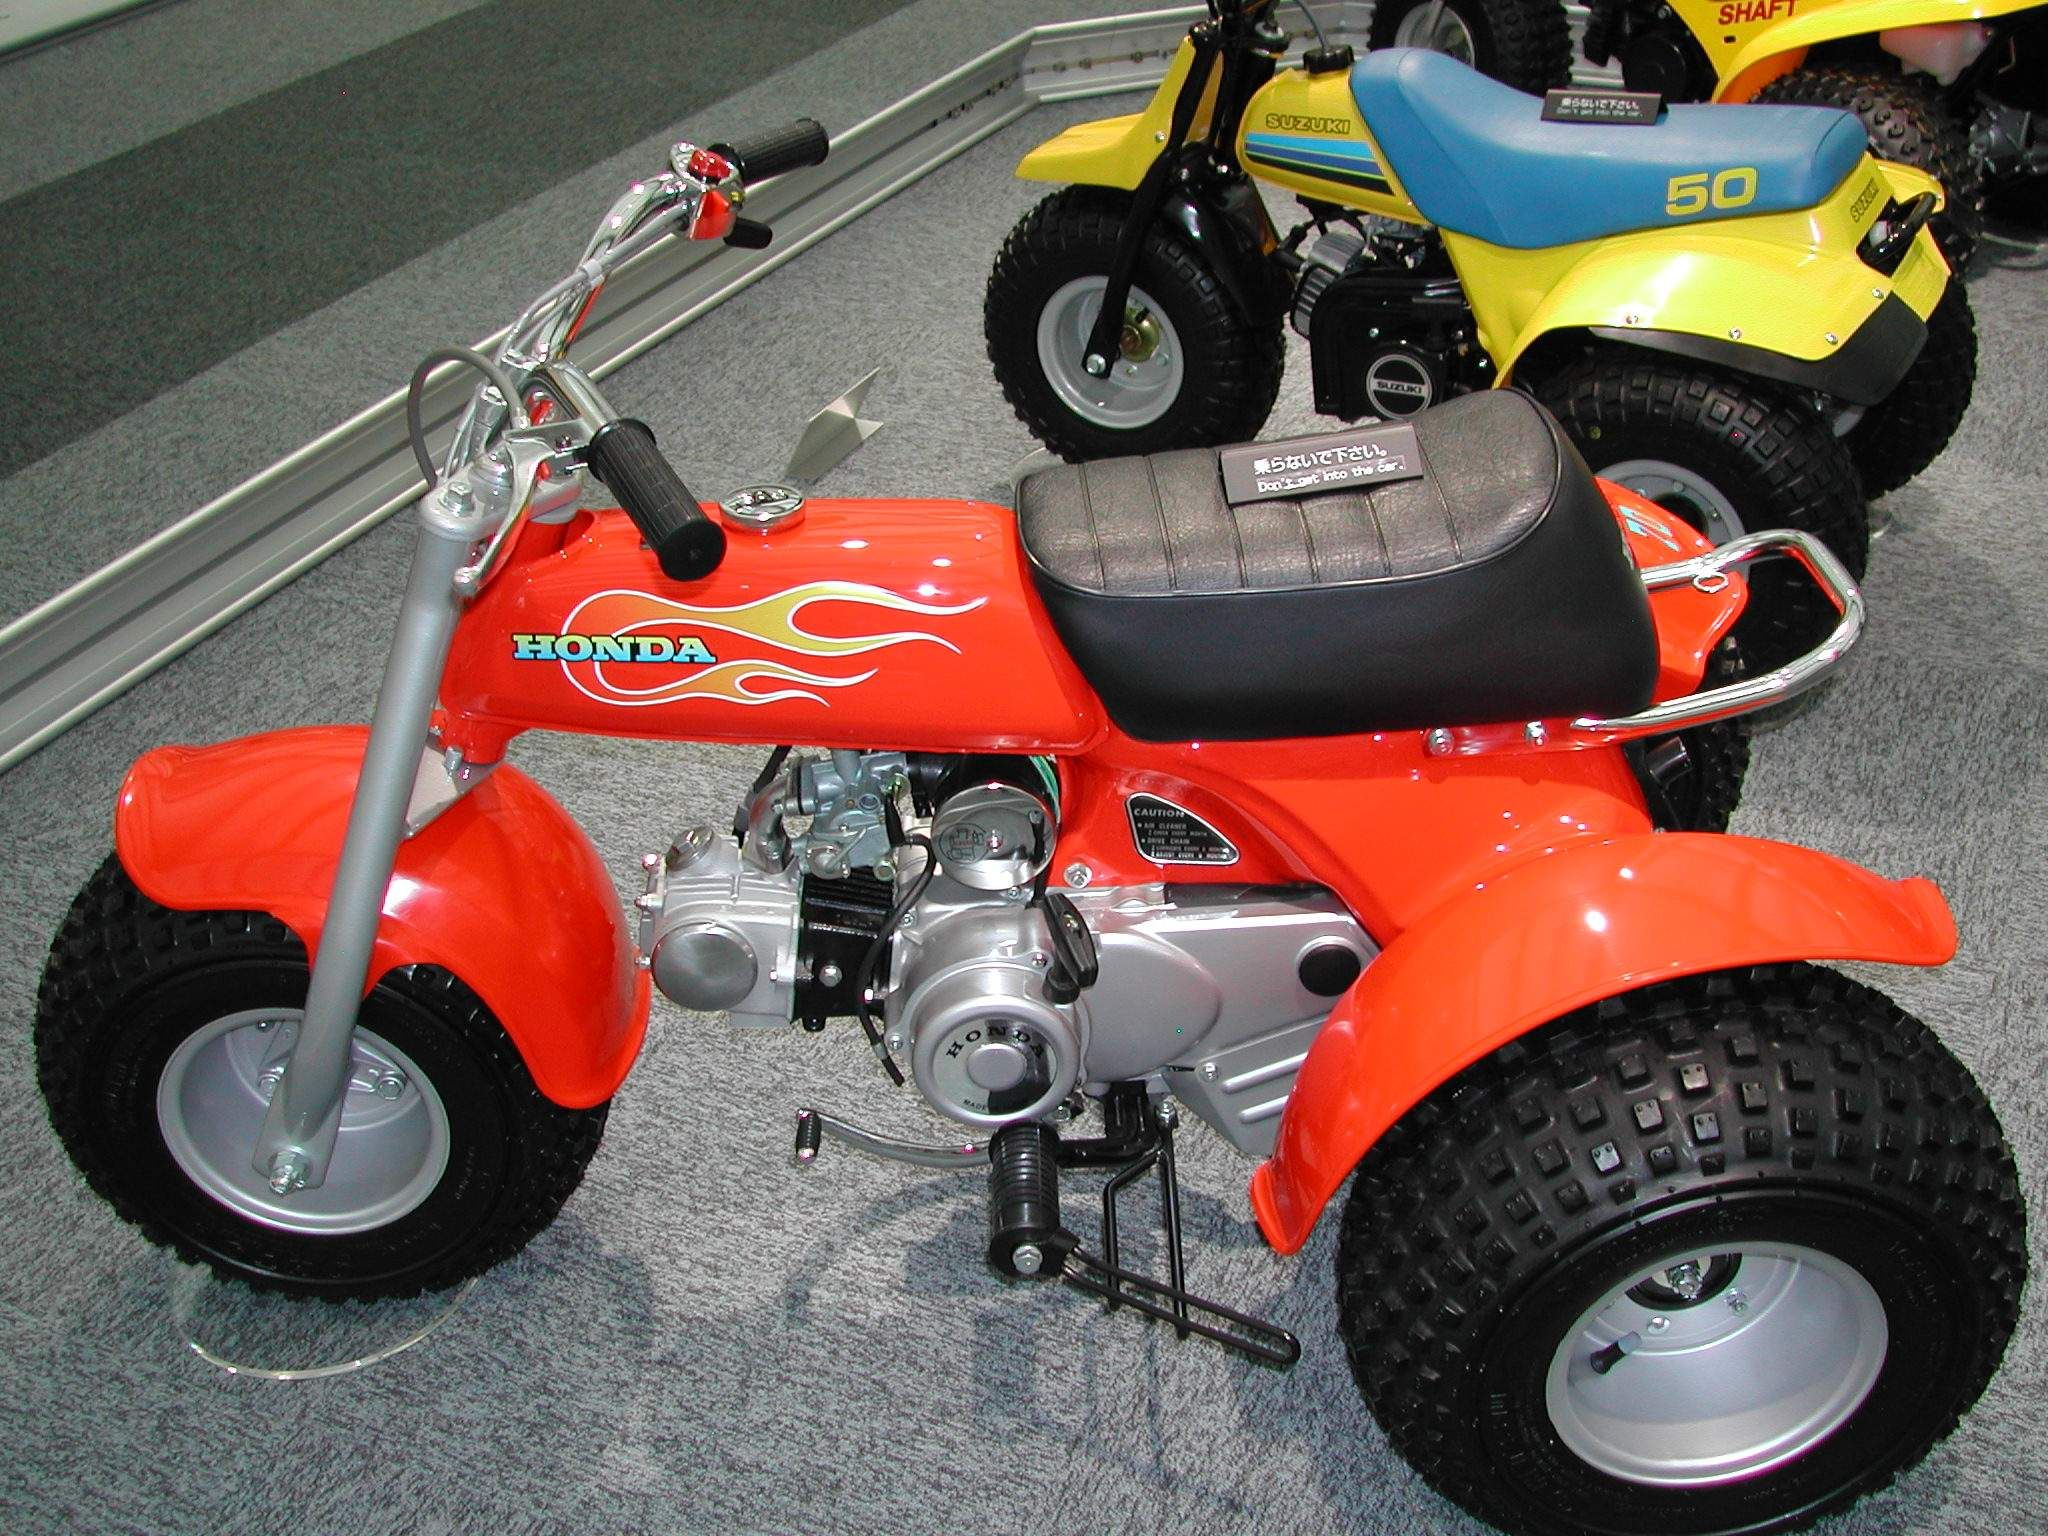 Honda Atc 70 : Honda atc bikes owned pinterest